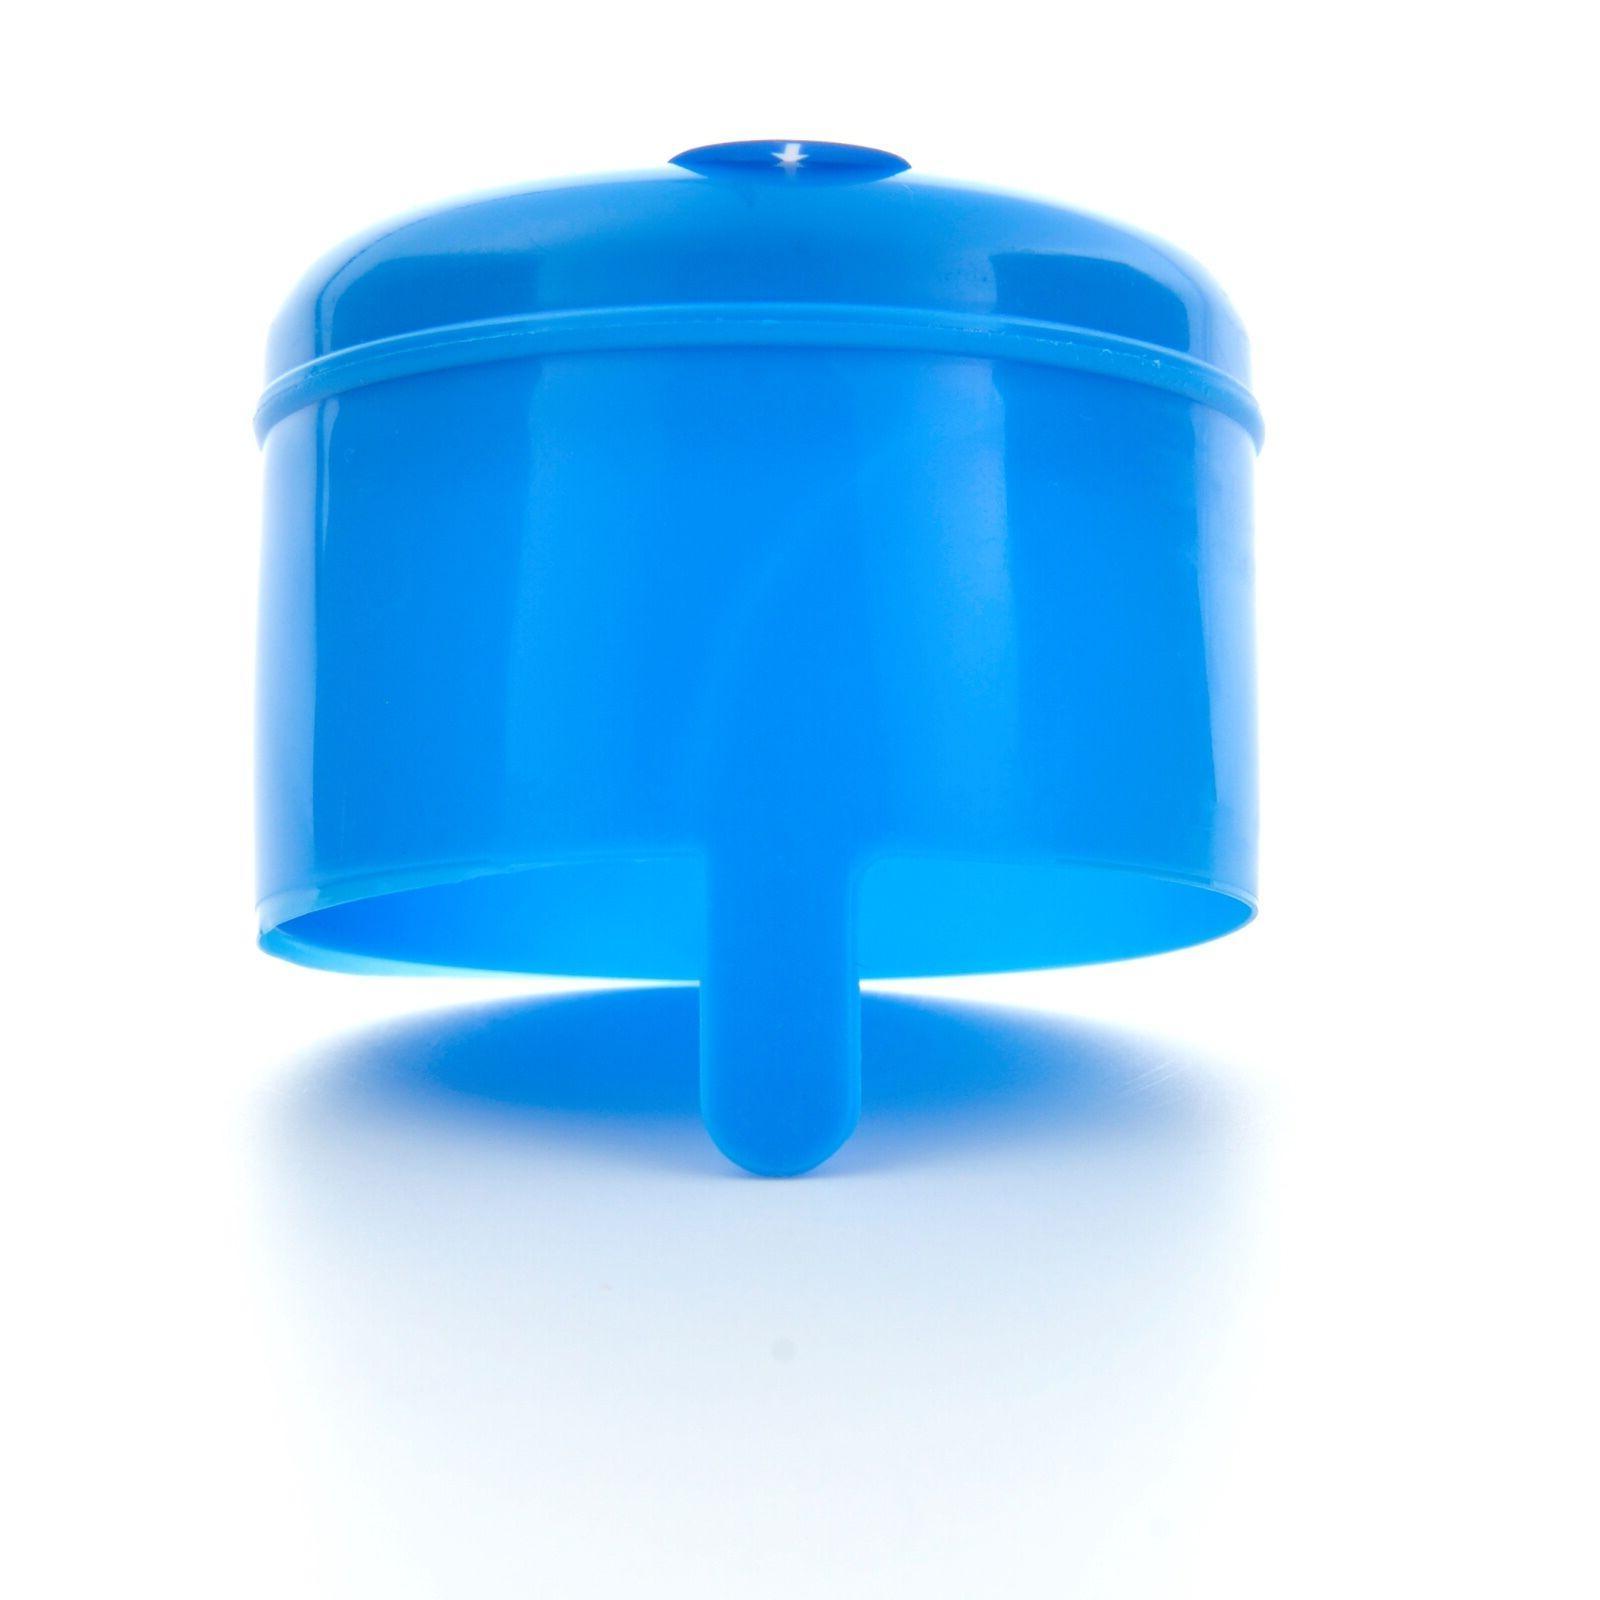 3 Gallon Water Water Cooler BPA-FREE Caps